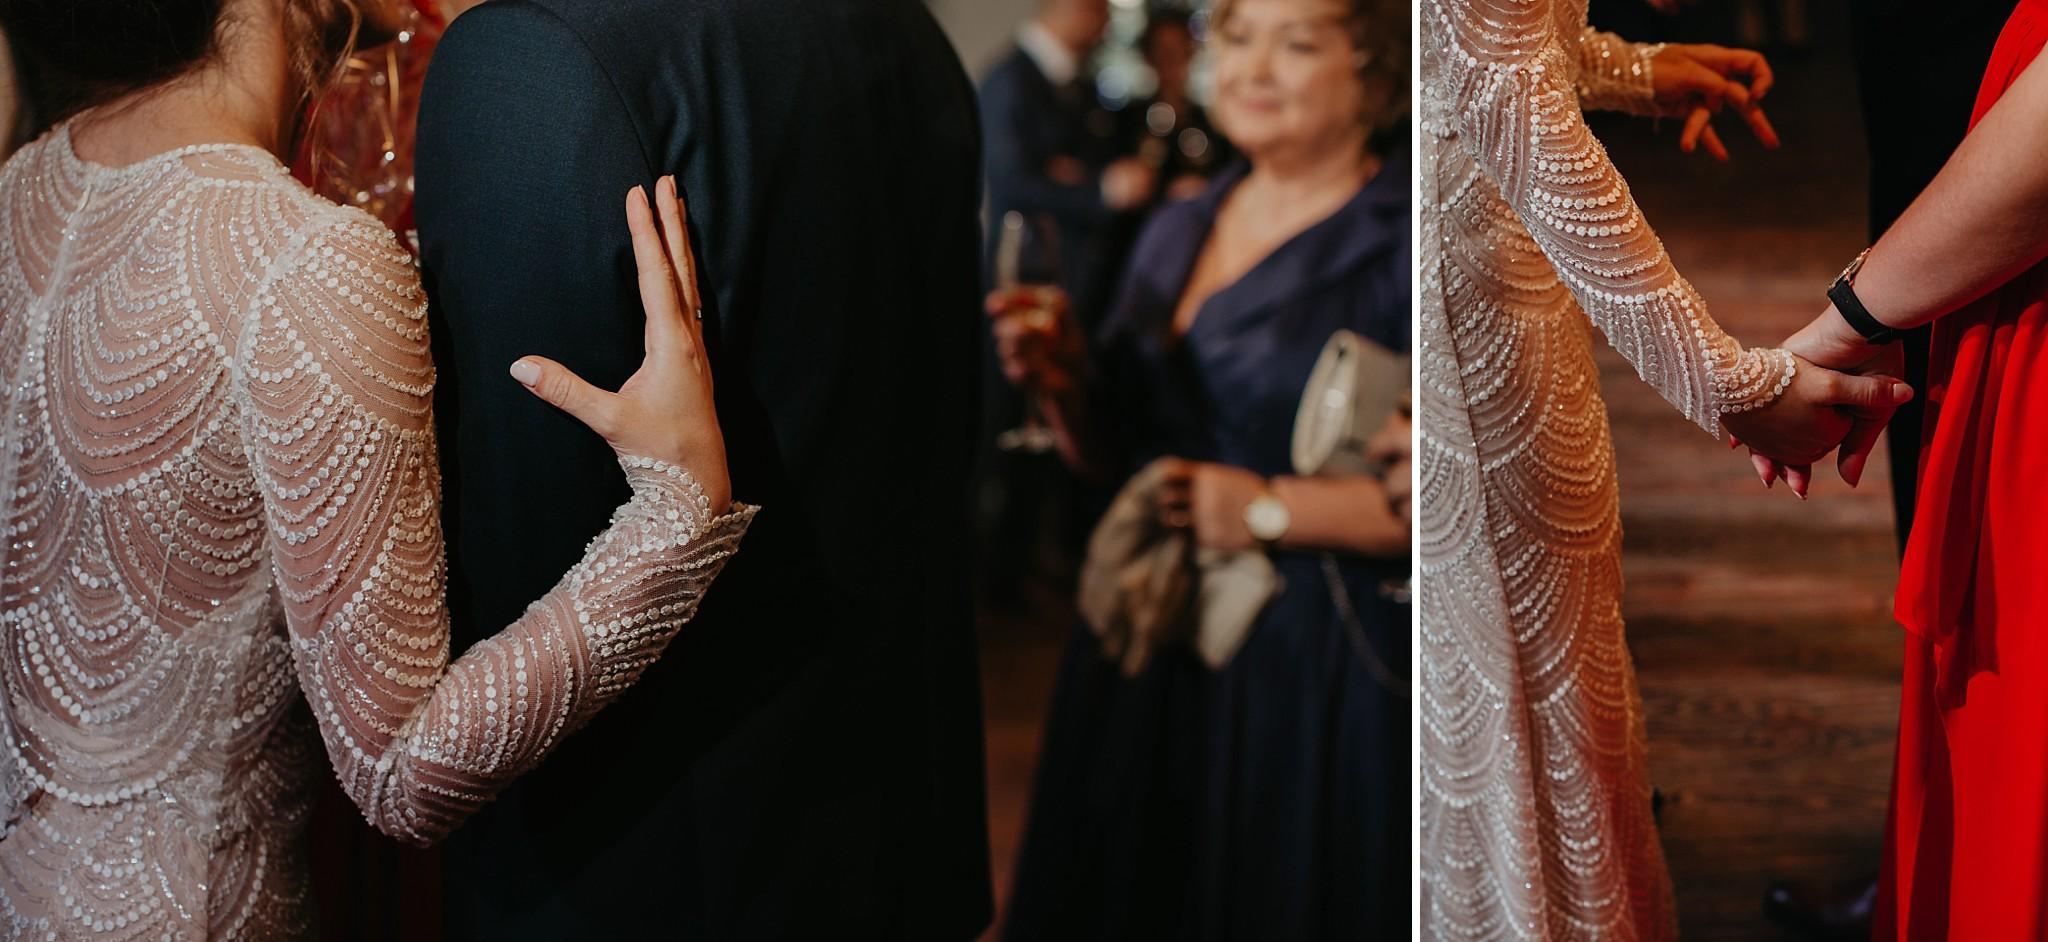 fotograf poznan wesele dobra truskawka piekne wesele pod poznaniem wesele w dobrej truskawce piekna para mloda slub marzen slub koronawirus slub listopad wesele koronawirus 284